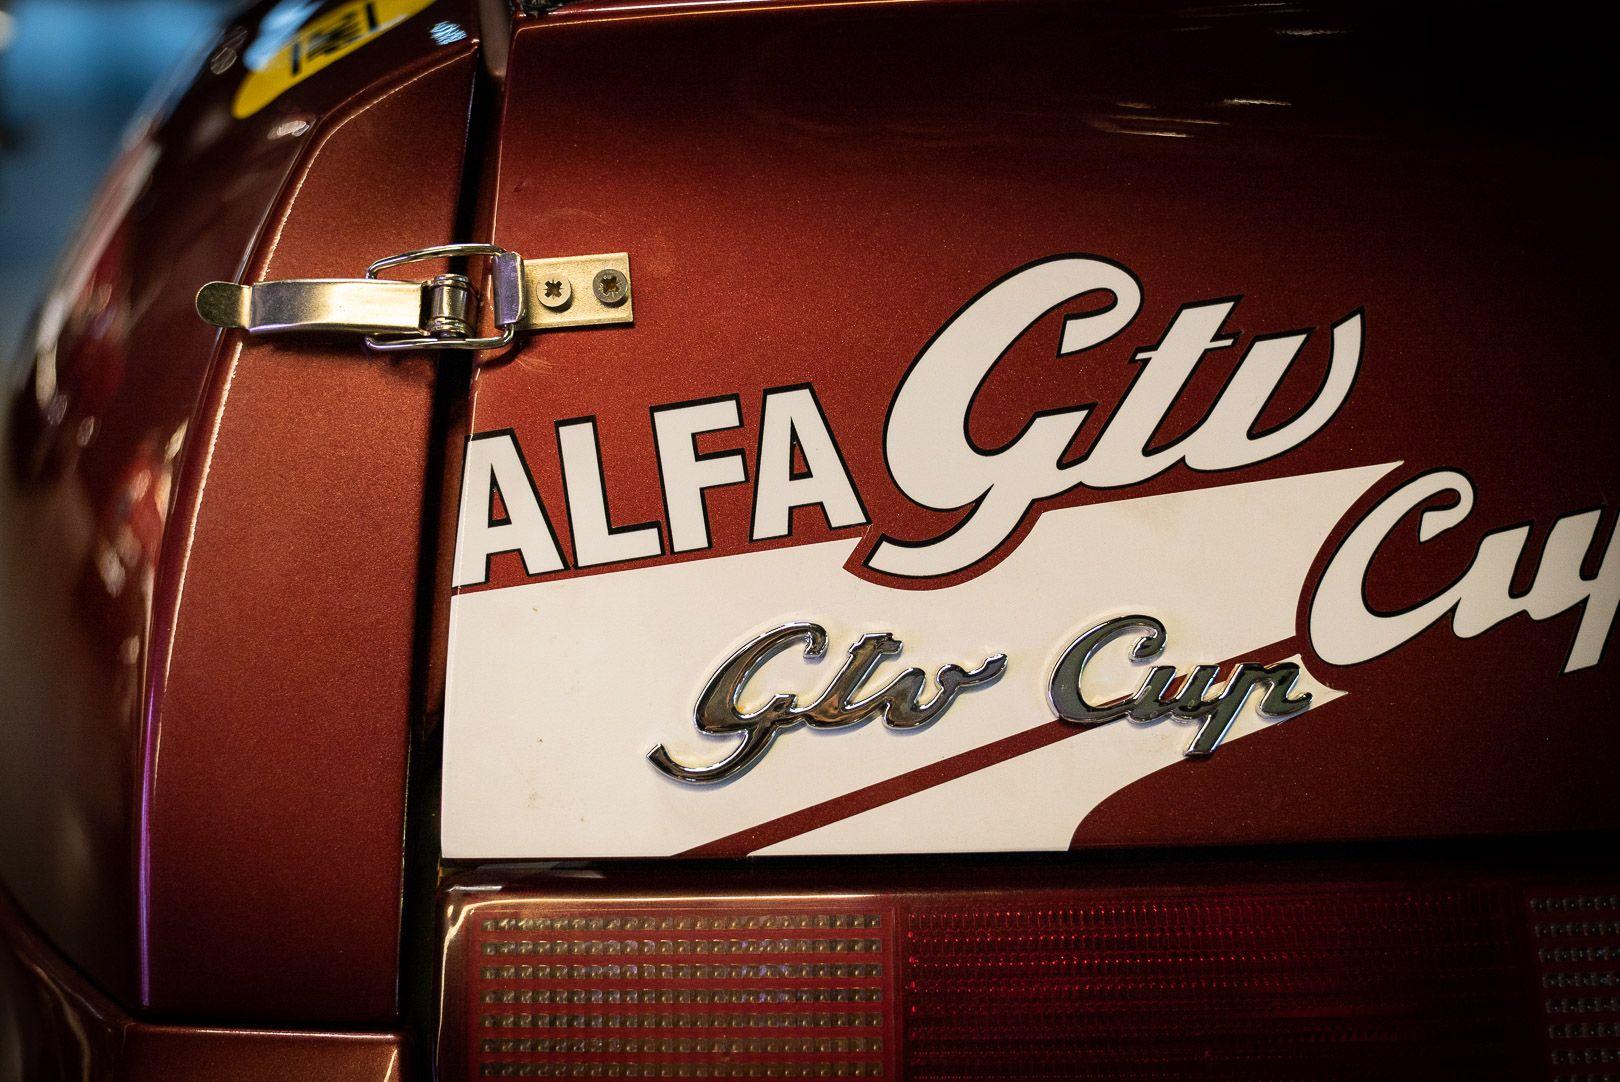 1995 Alfa Romeo GTV 2.0 V6 Turbo Cup Replica 59940